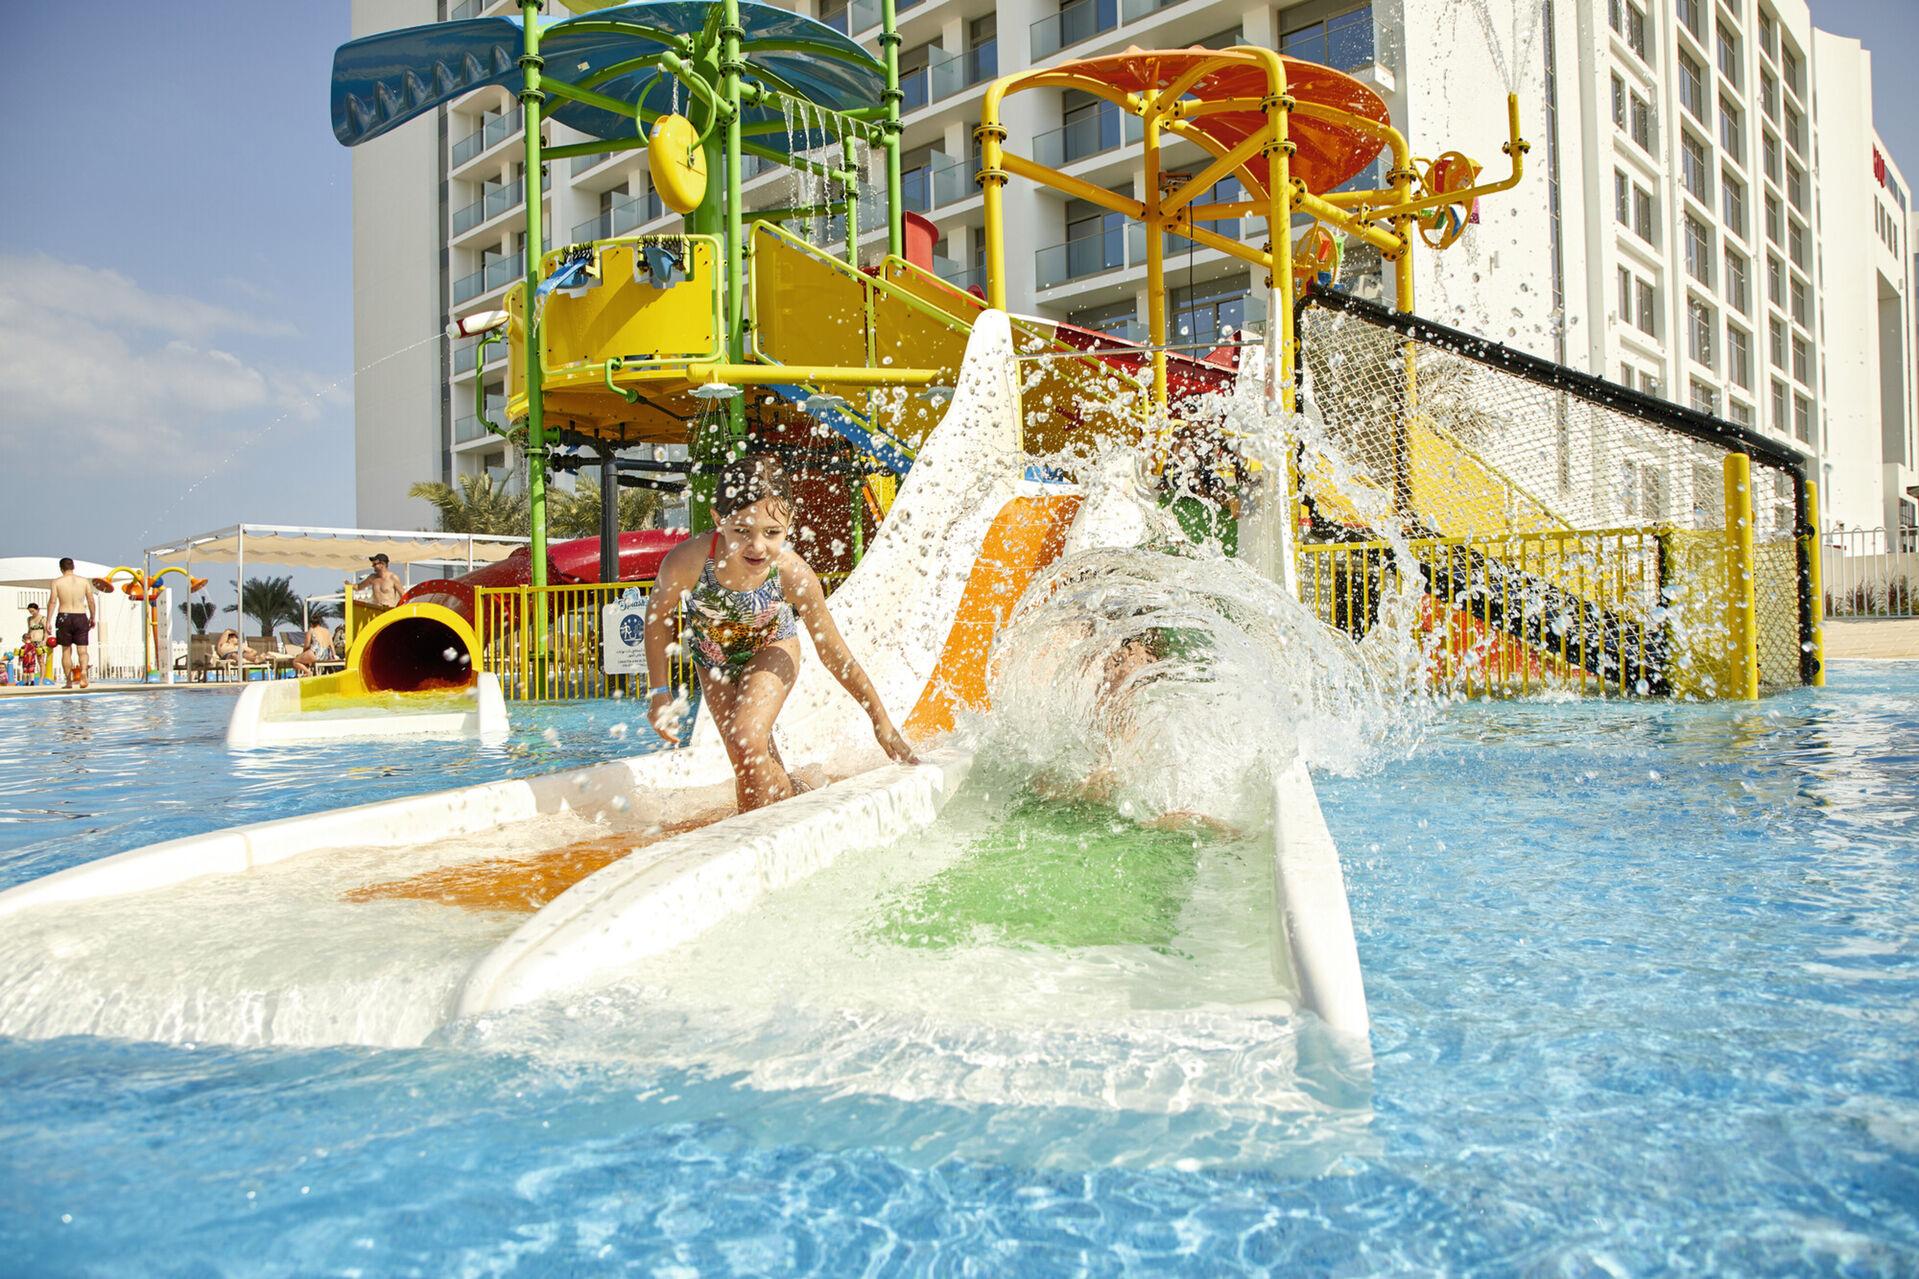 https://cms.satur.sk/data/imgs/tour_image/orig/dub_20_032-childrens-pool-with-slides-1939863.jpg